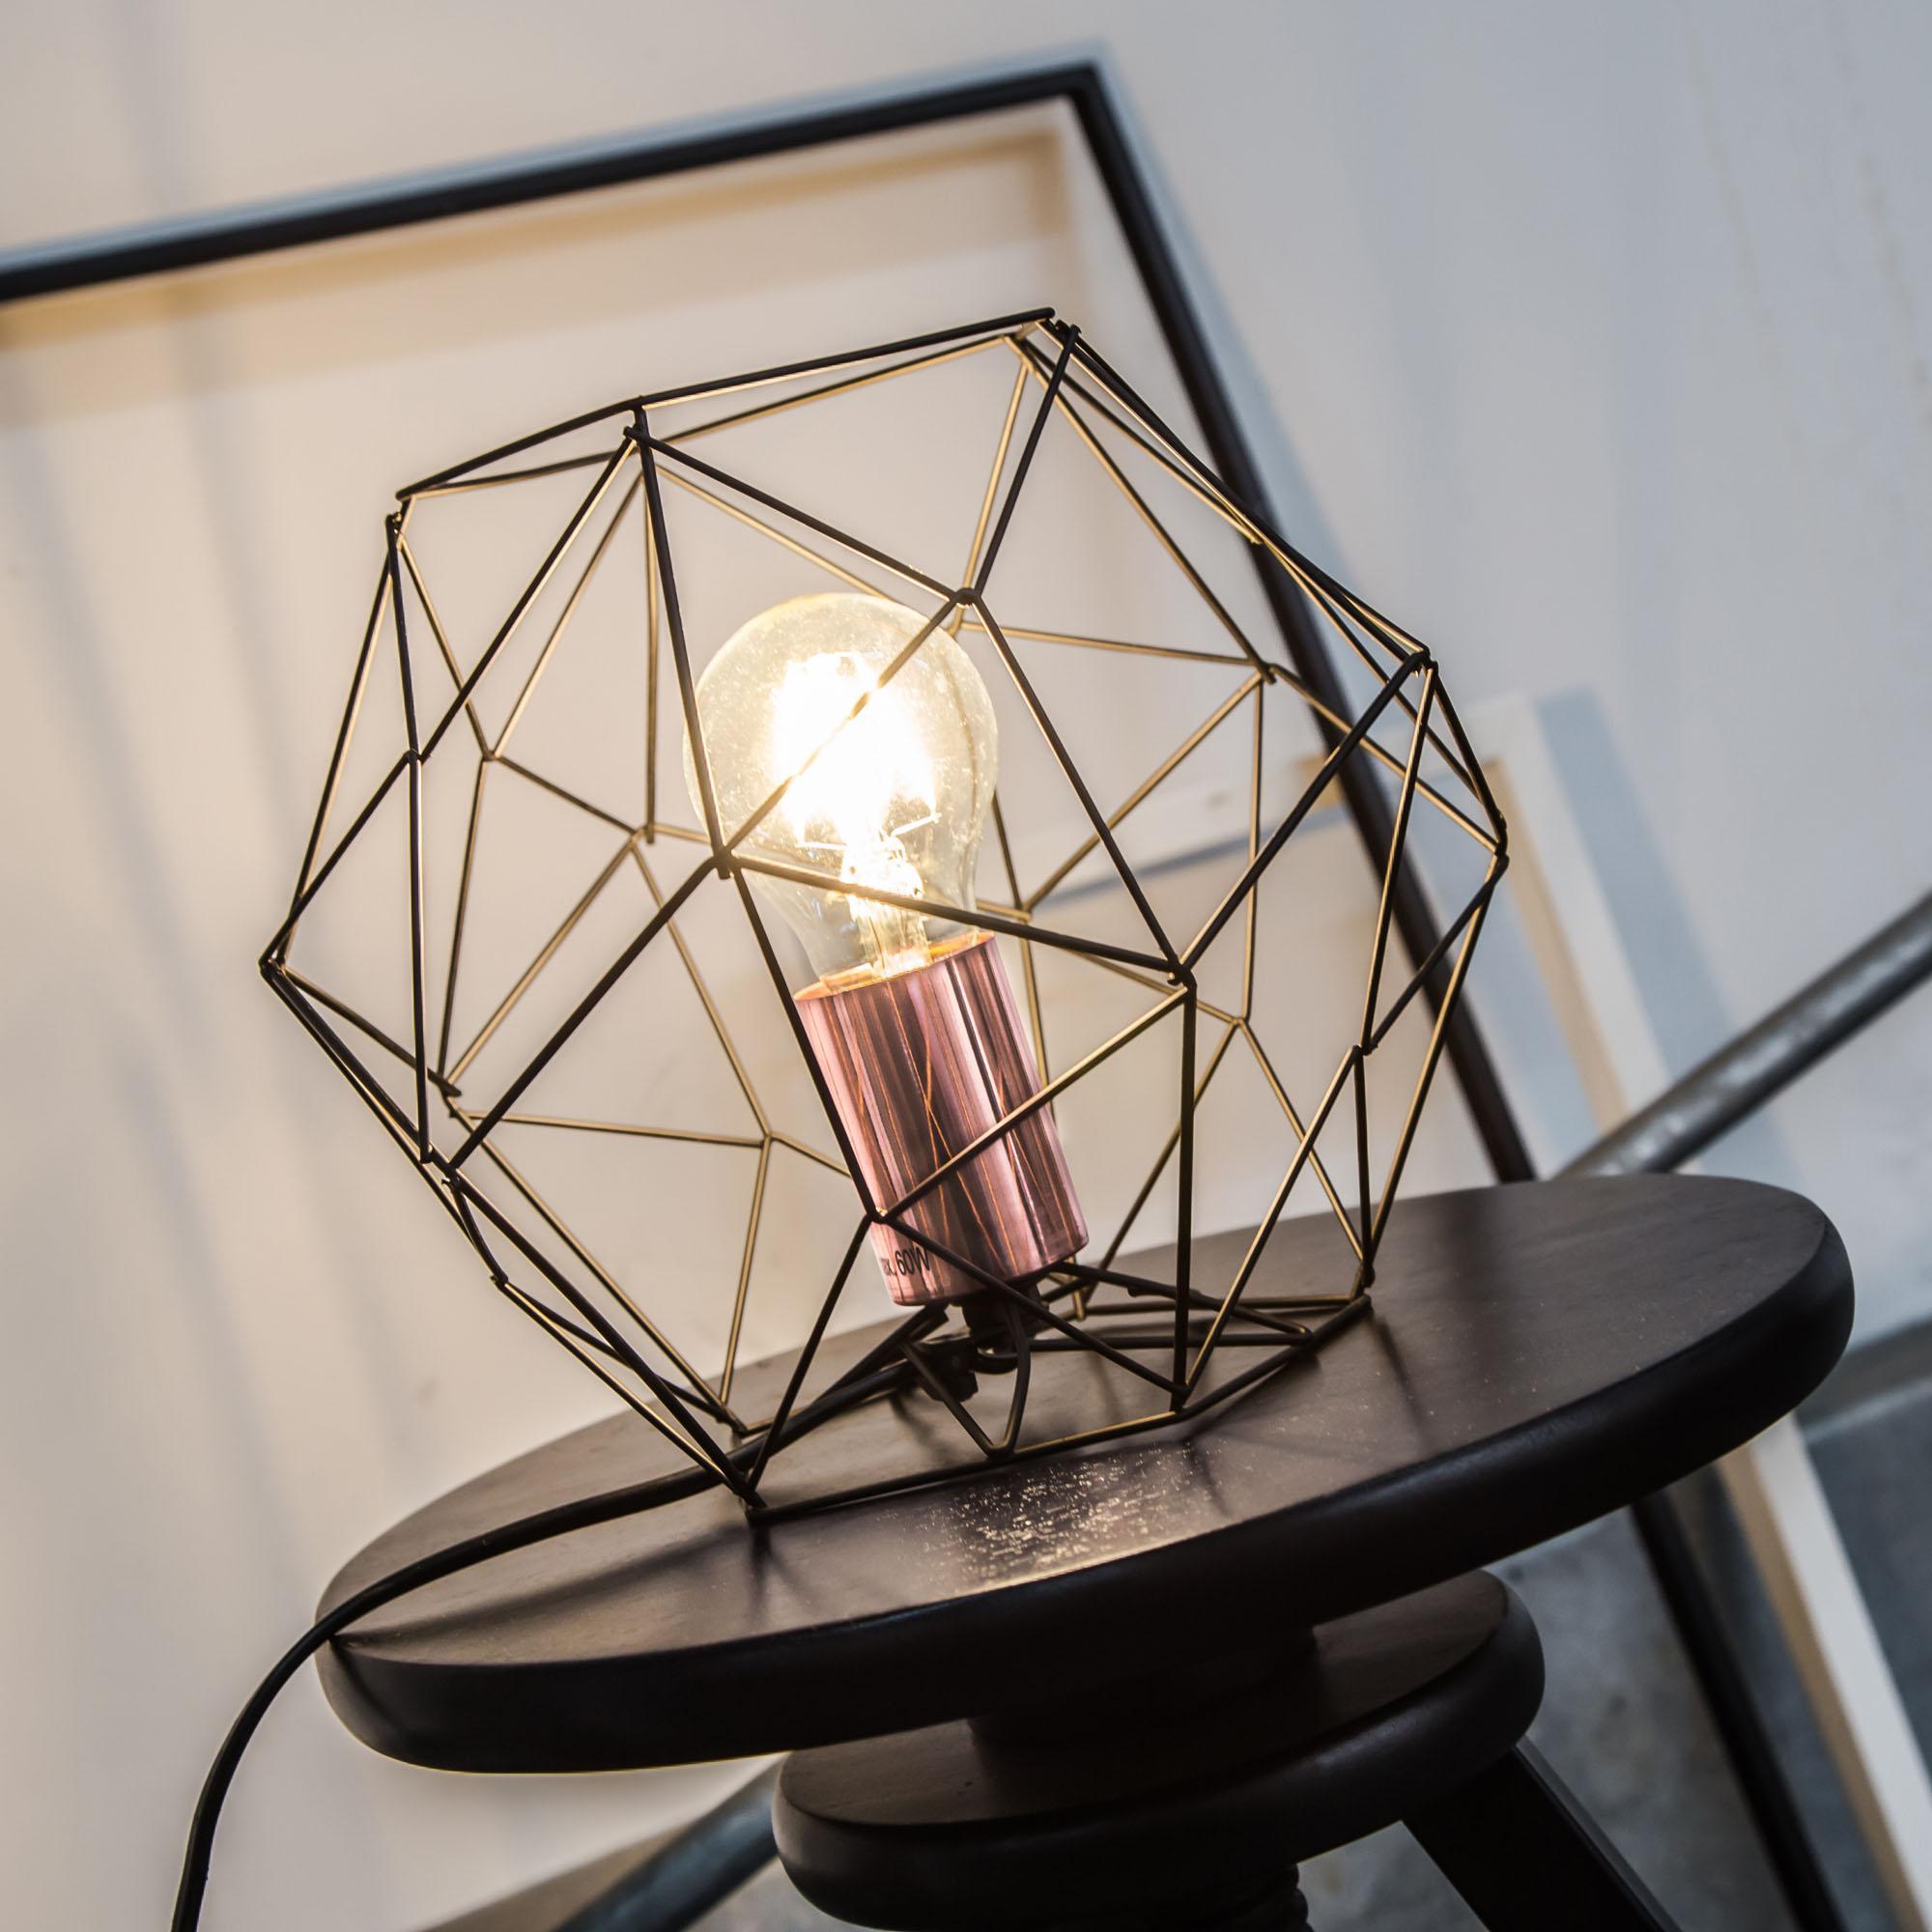 Tischlampe Vintage Metall